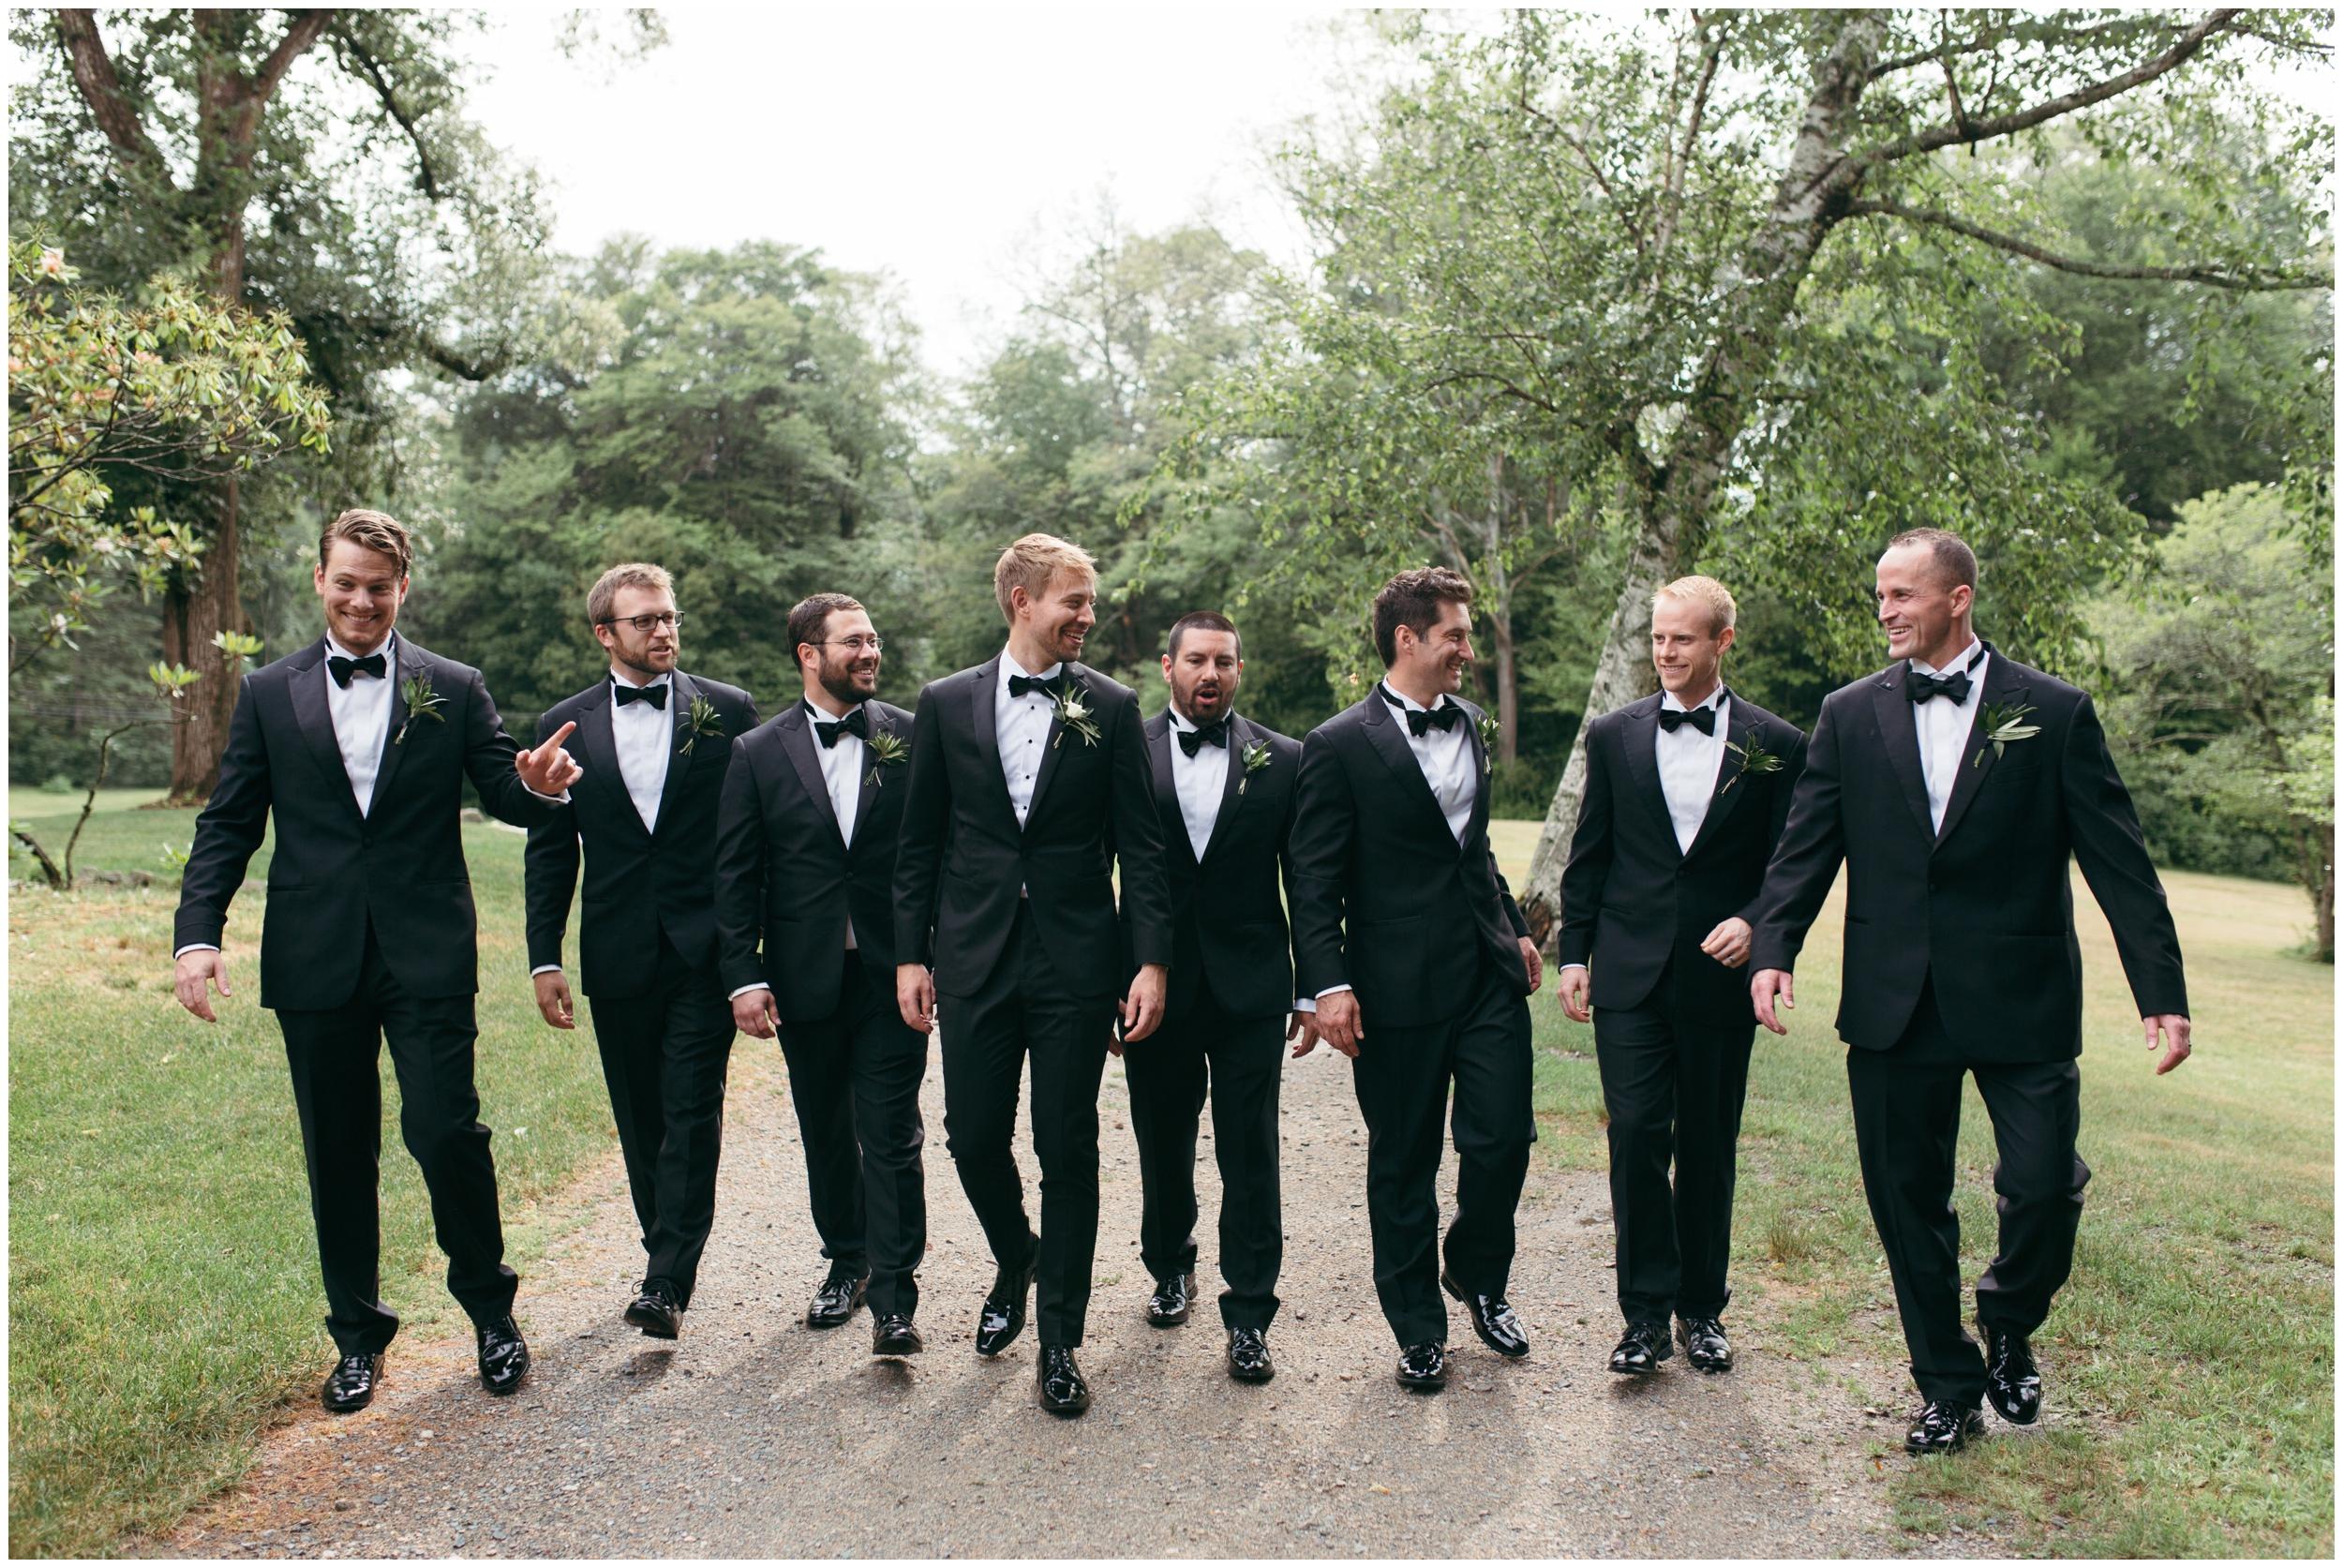 Willowdale-Estate-Wedding-Bailey-Q-Photo-Boston-Wedding-Photographer-020.JPG